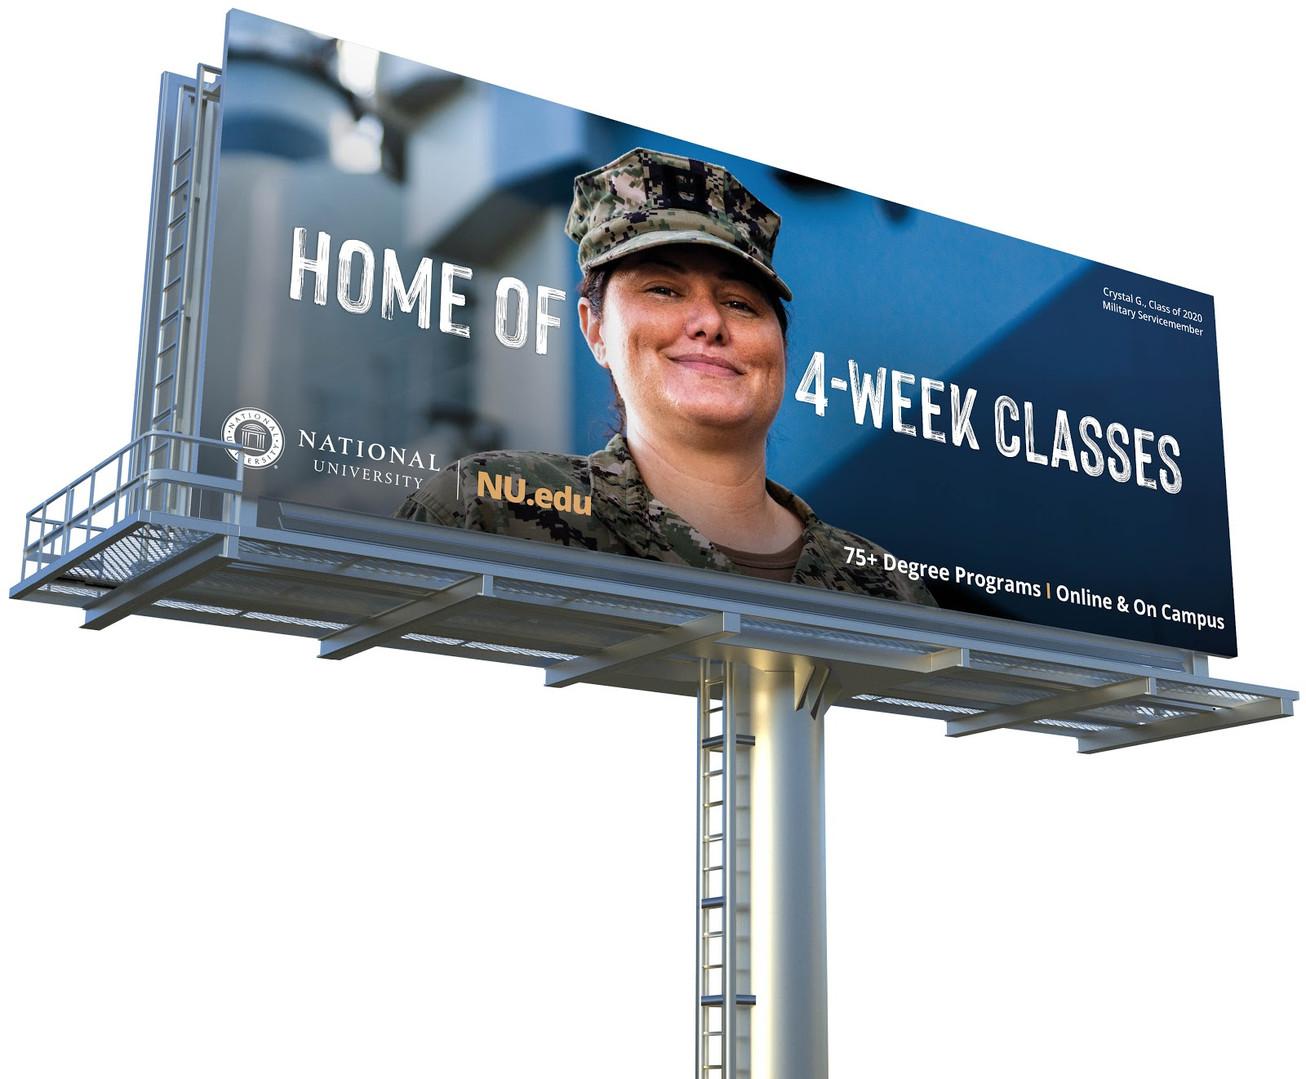 Home of 4-Week Classes